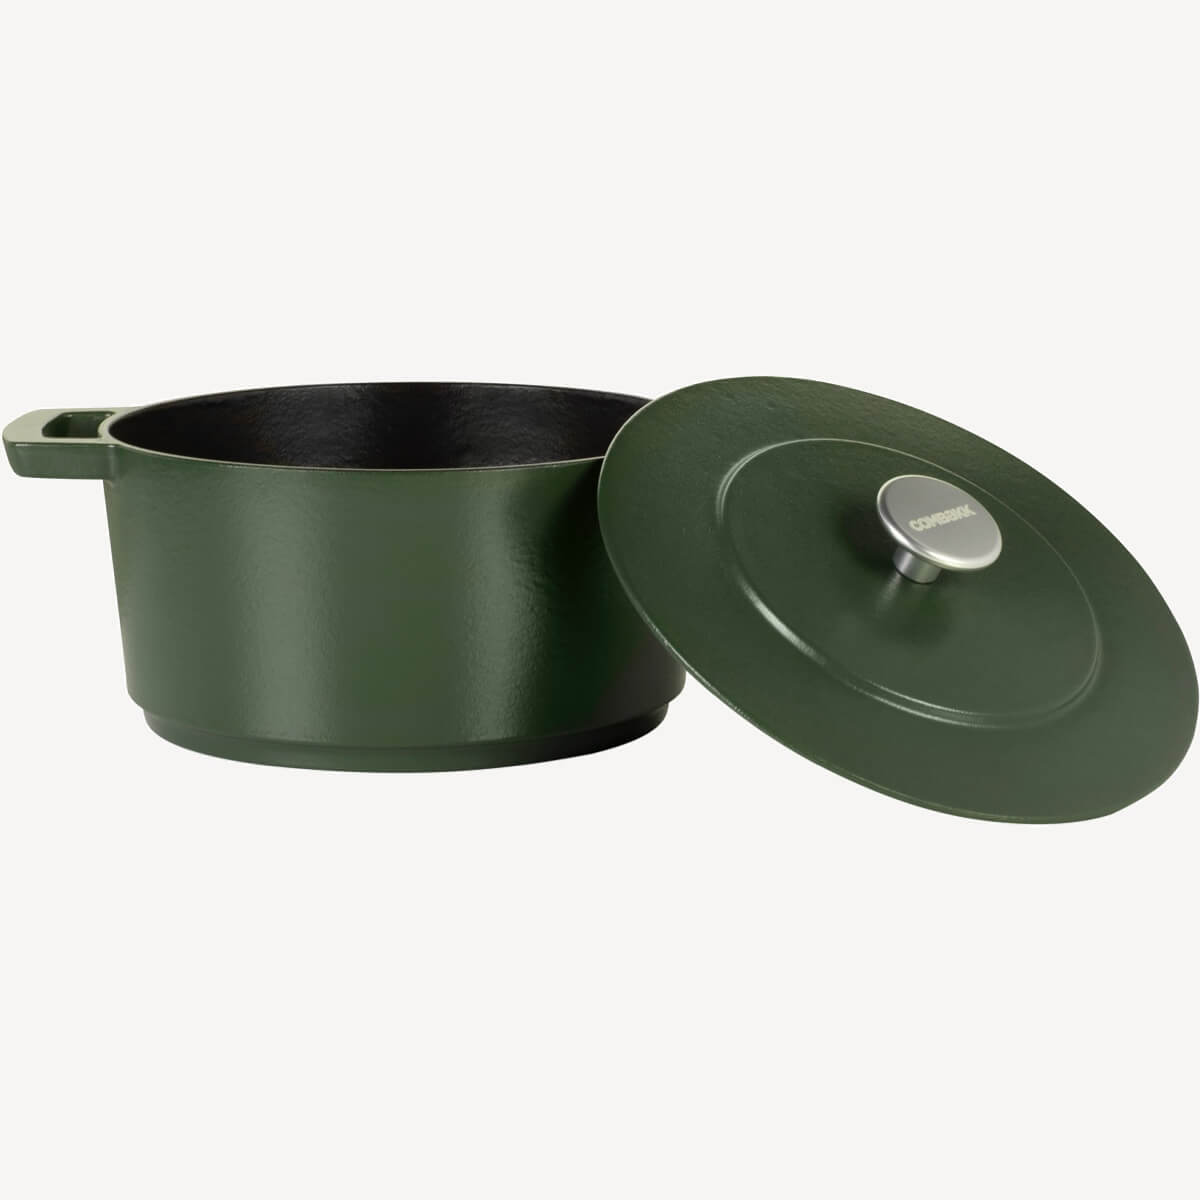 Dutch Oven Green 24CM